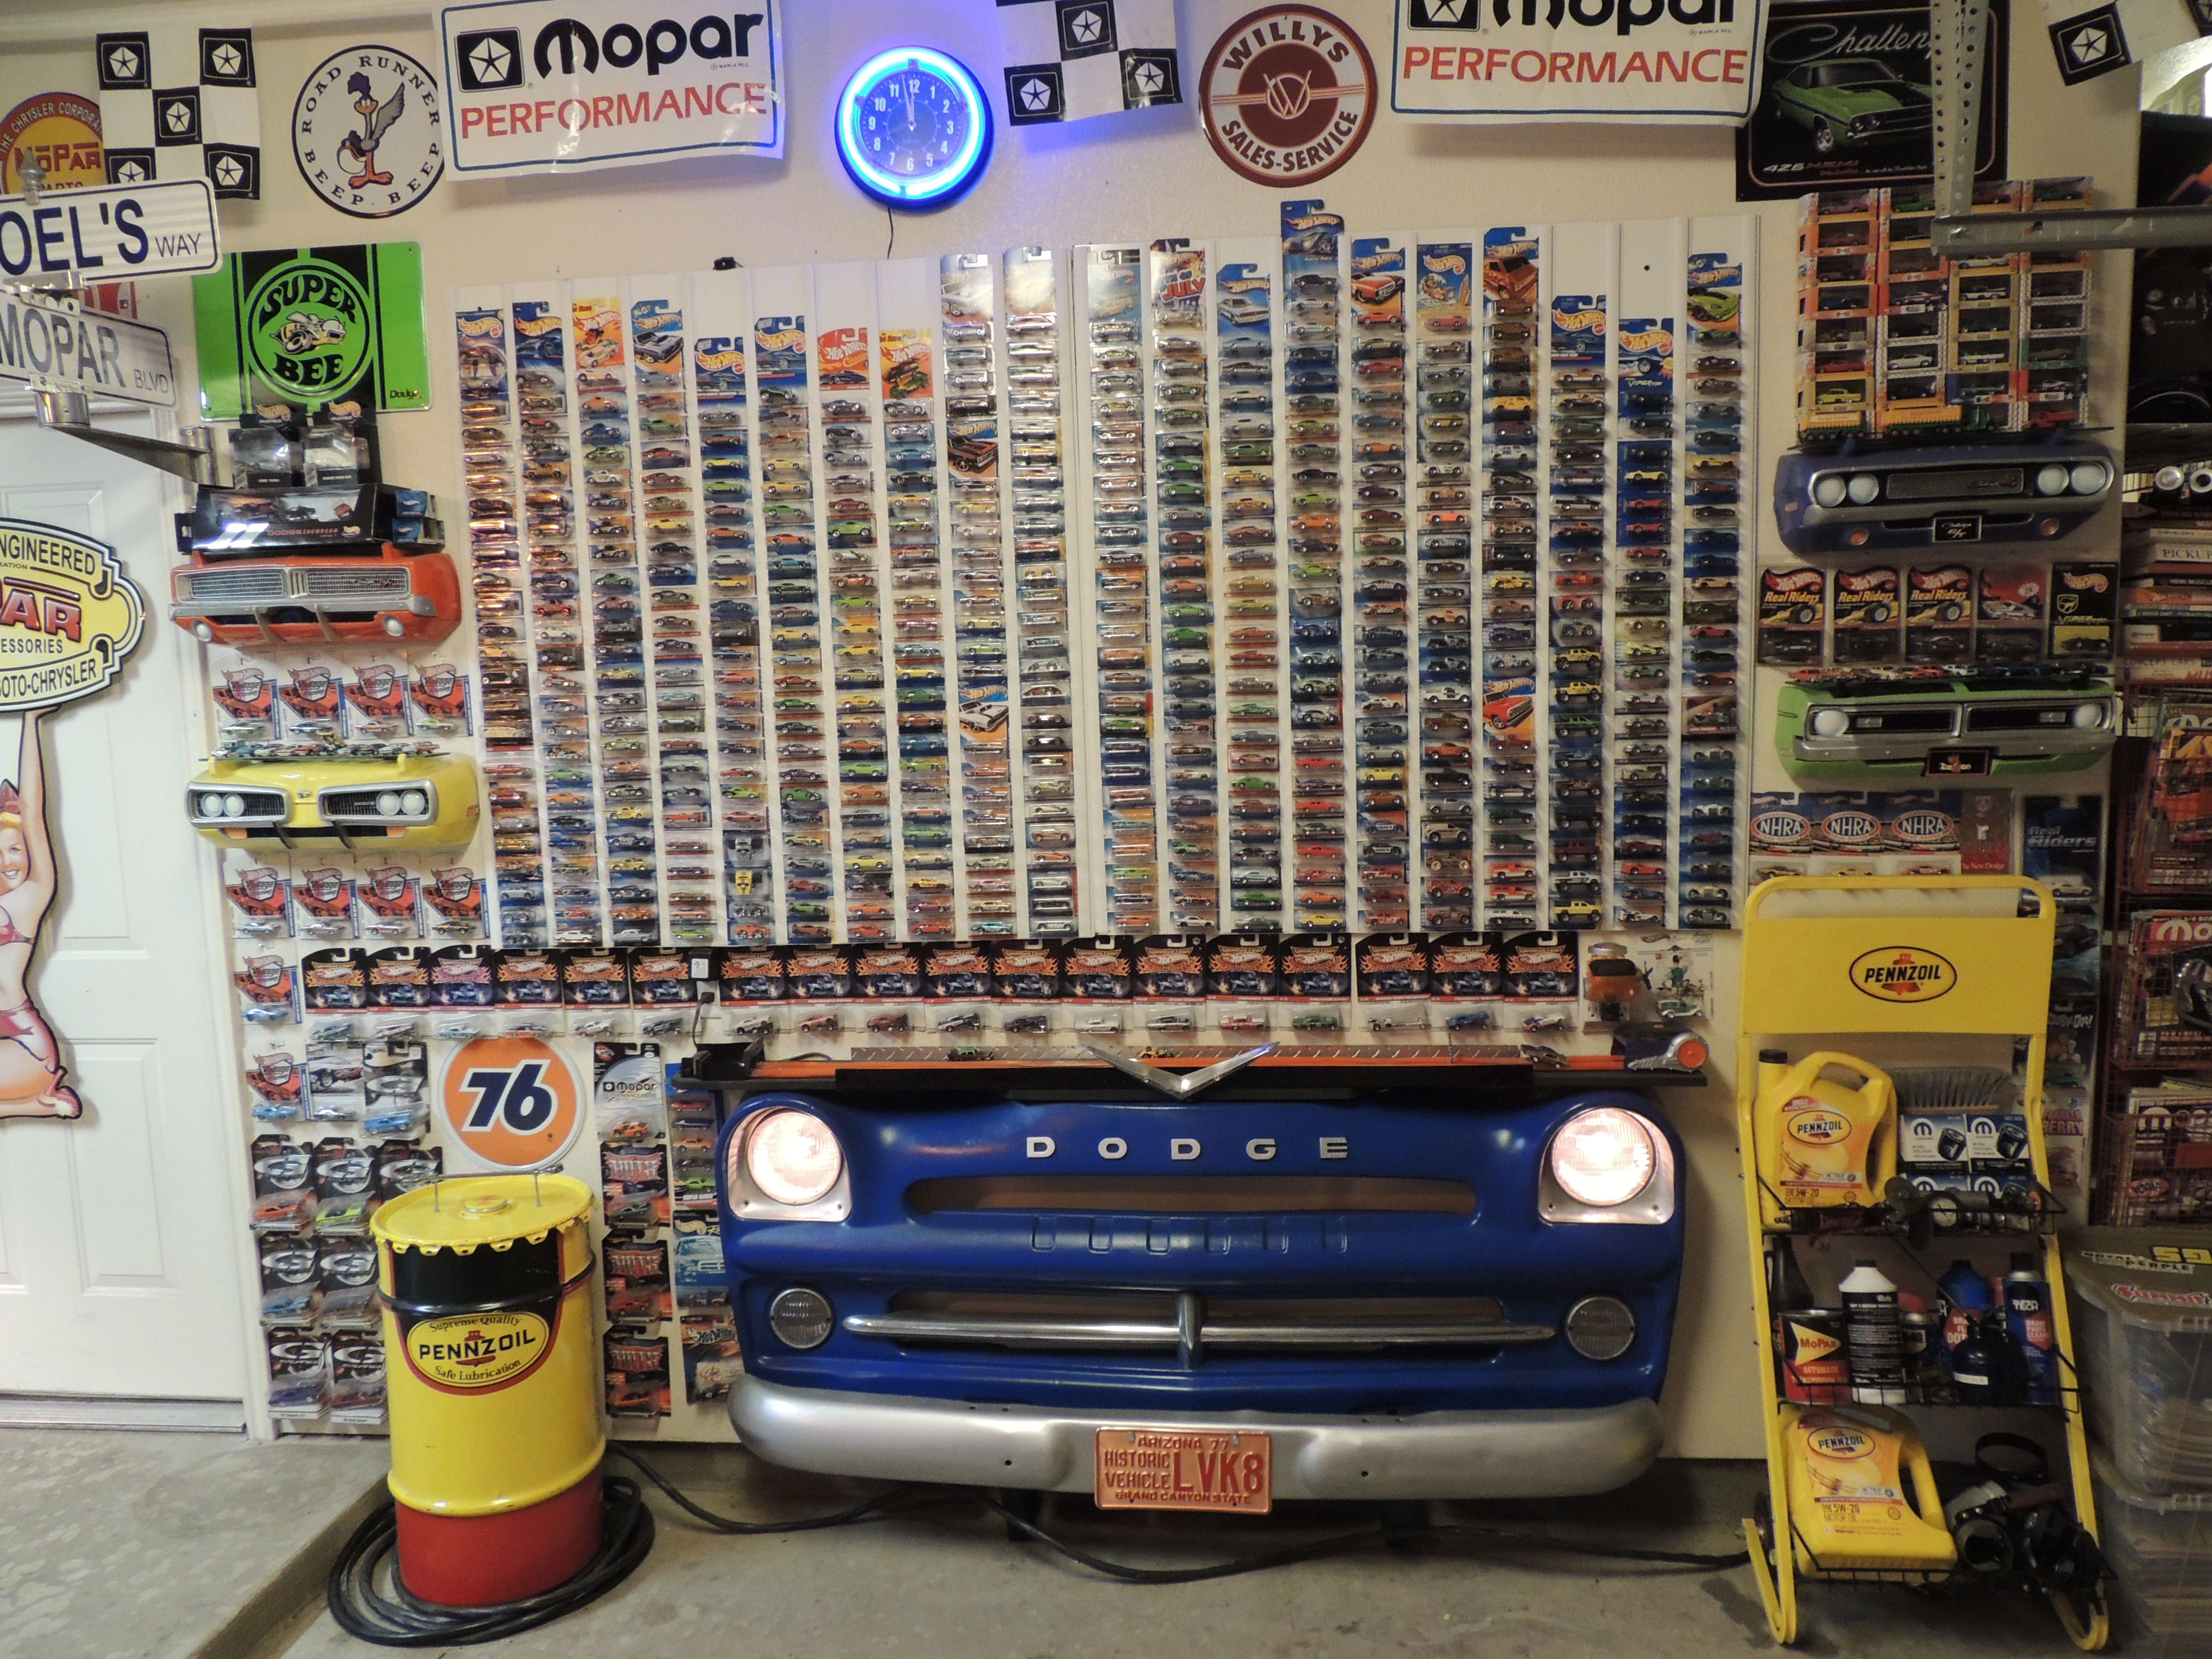 Man Cave On Wheels : Hot wheels display car themed stuff